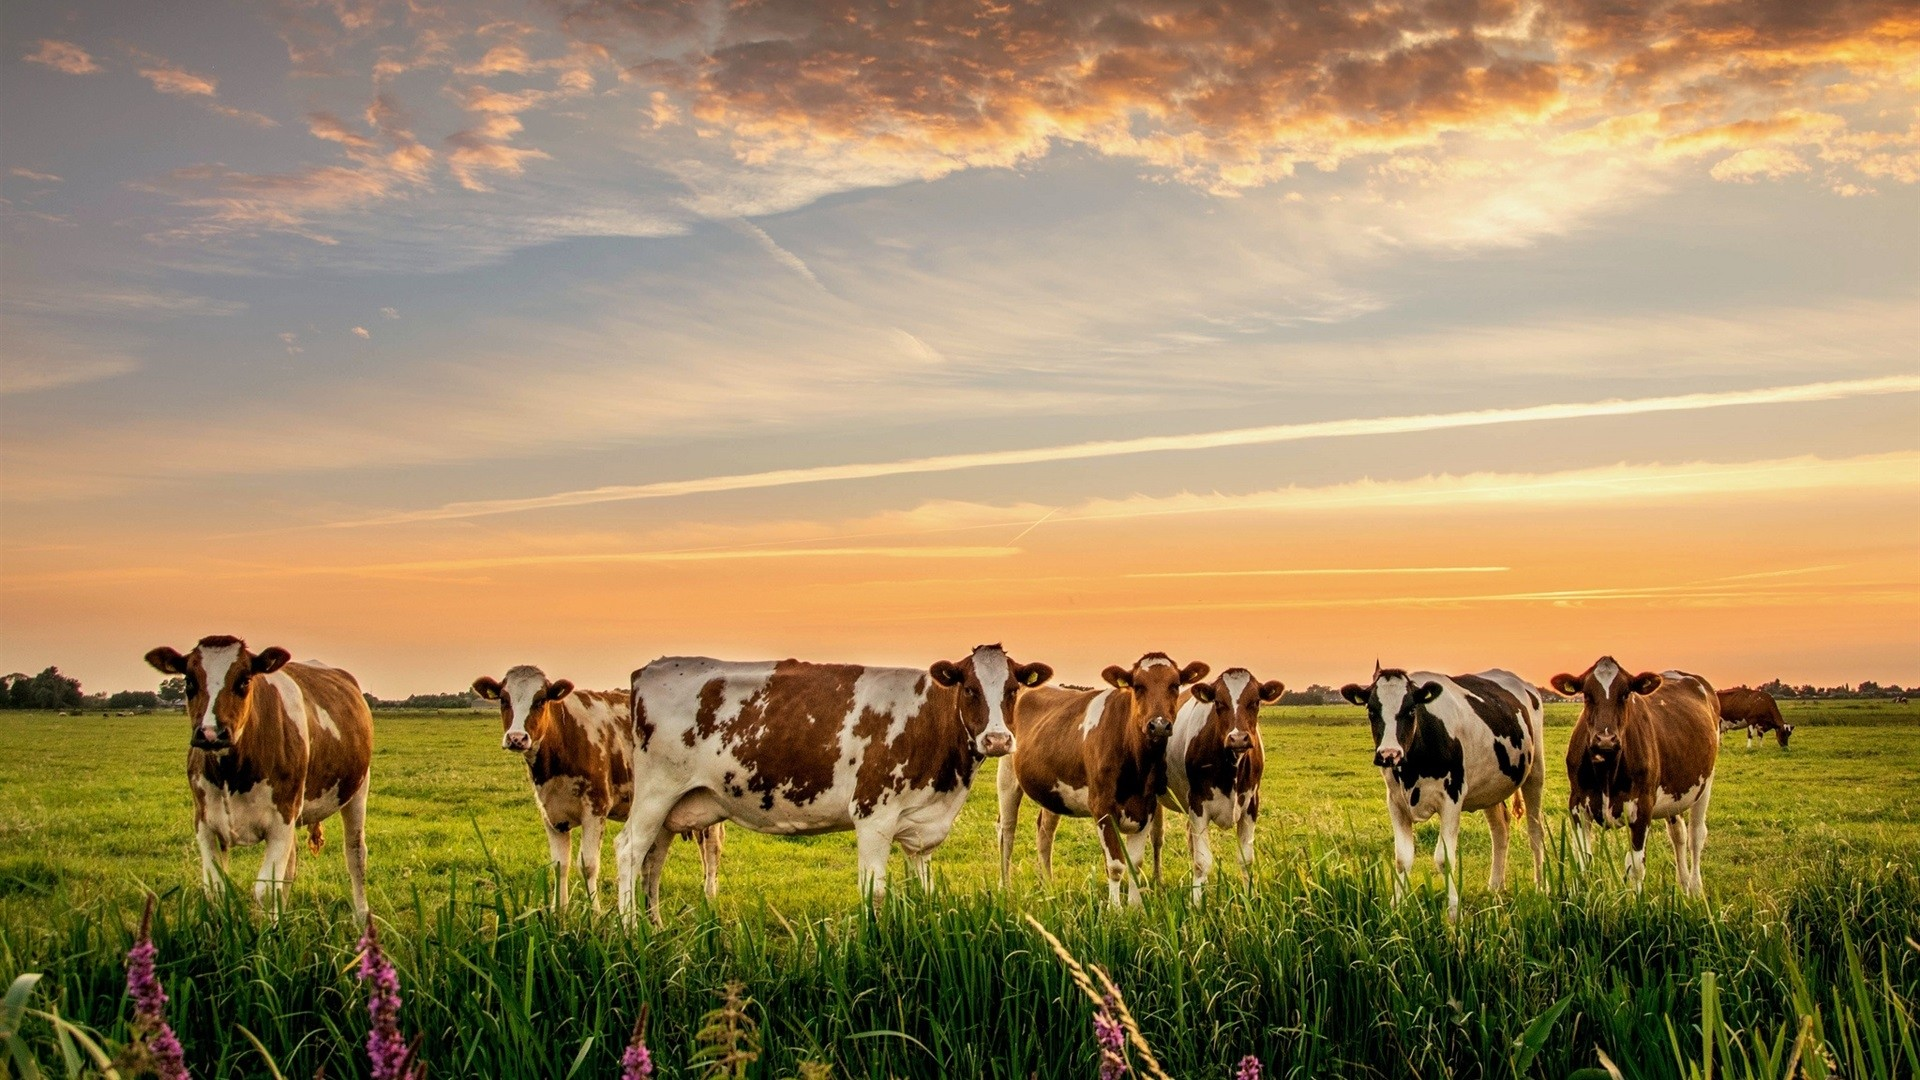 Cow a wallpaper